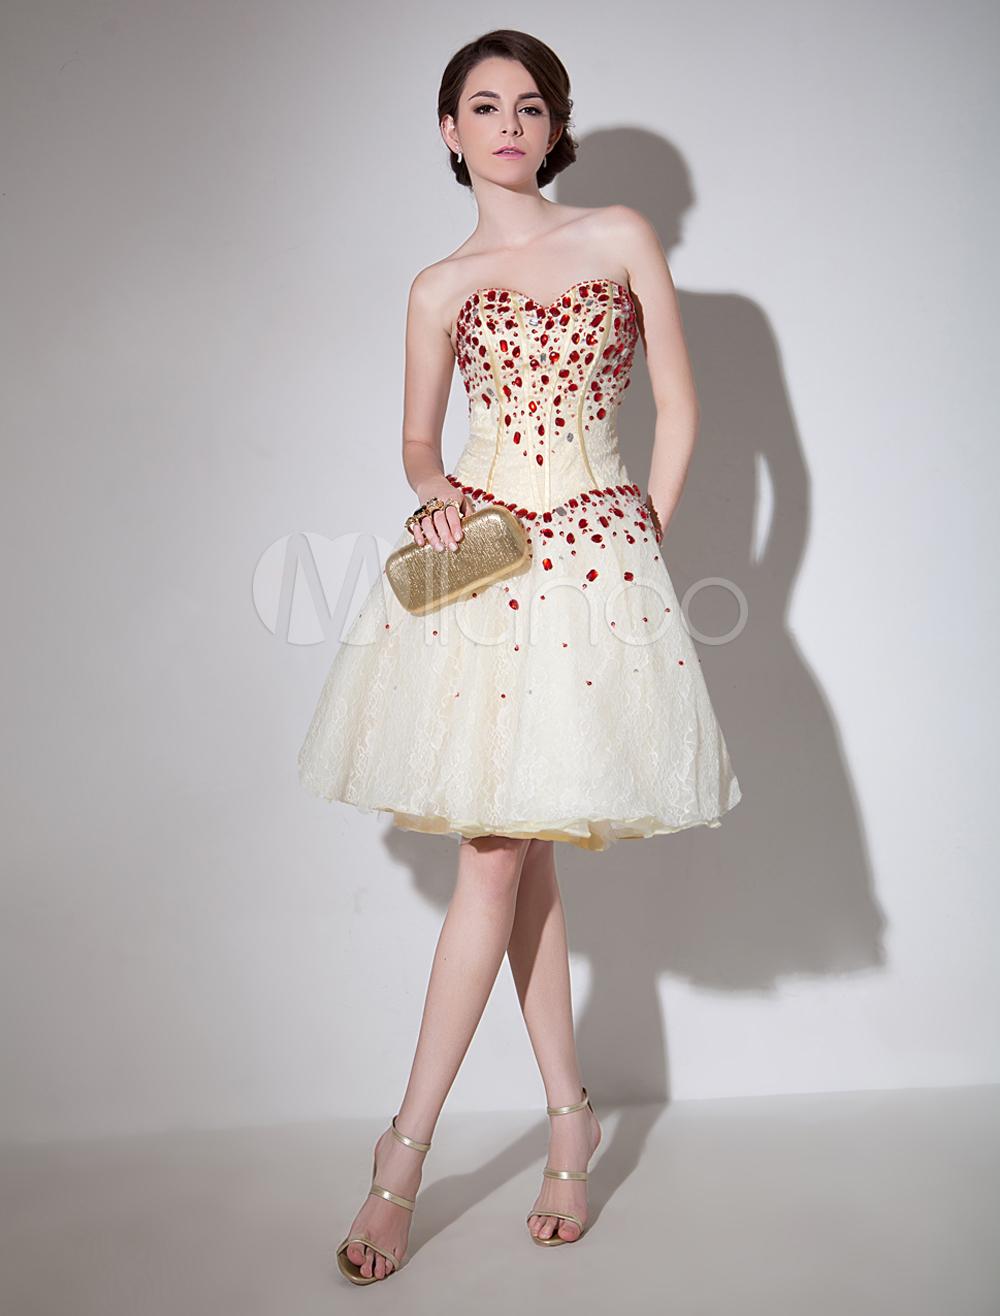 Glamour Ivory Sweetheart Neck Rhinestone A-line Lace Prom Dress Milanoo